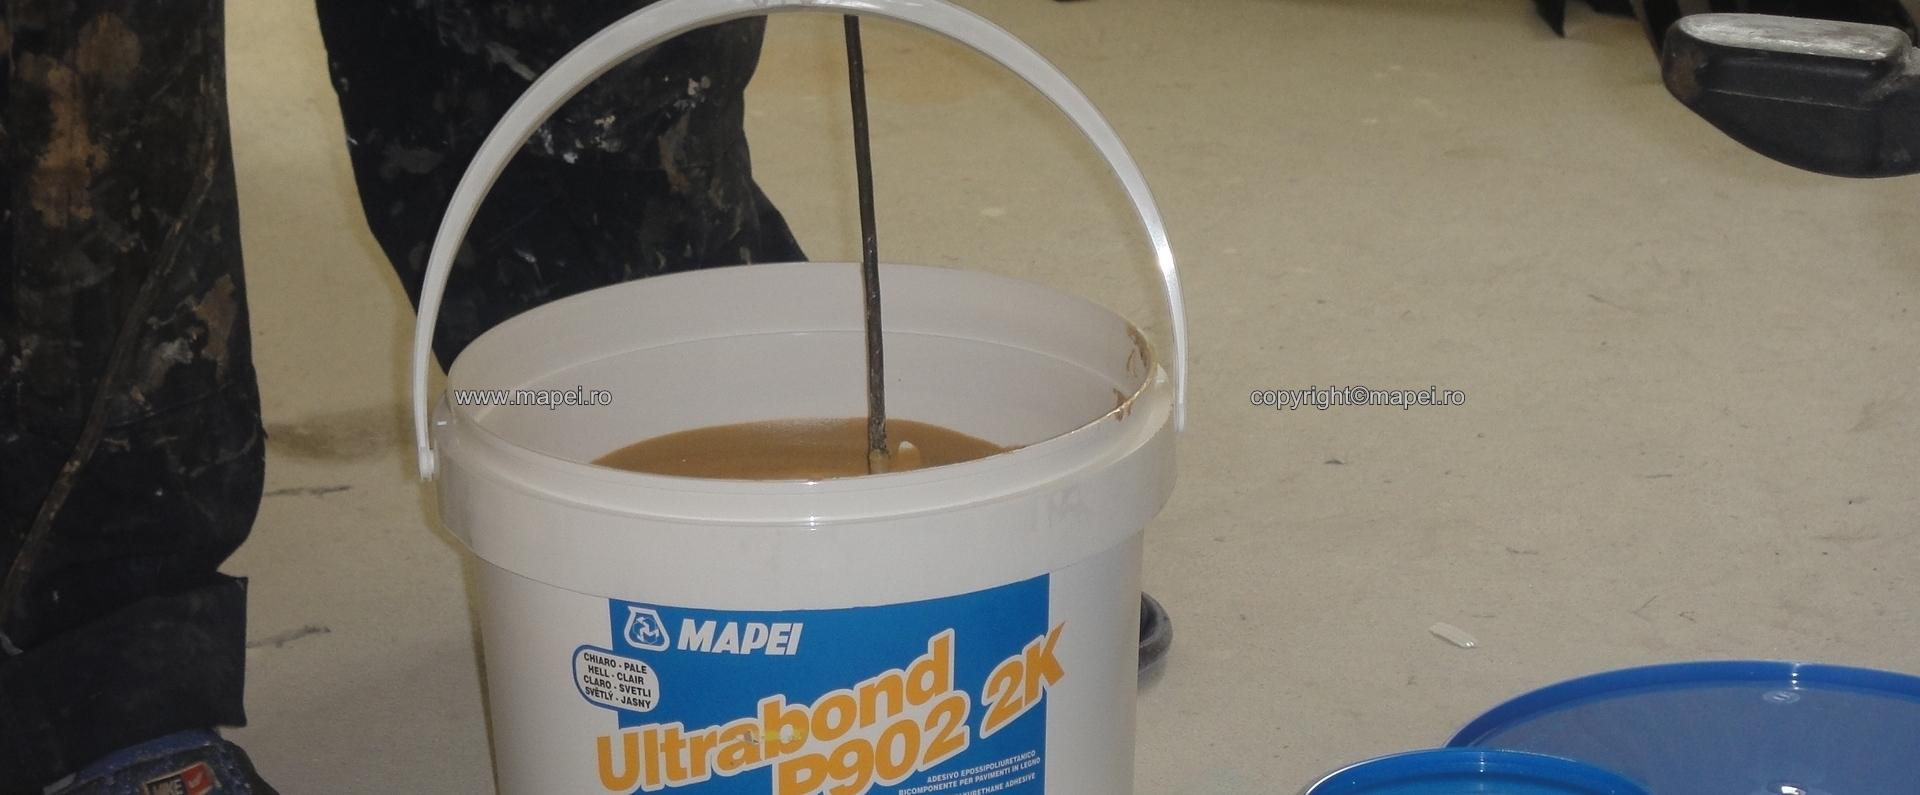 4 Preparare adeziv parchet Ultrabond P902 2K MAPEI - Poza 4